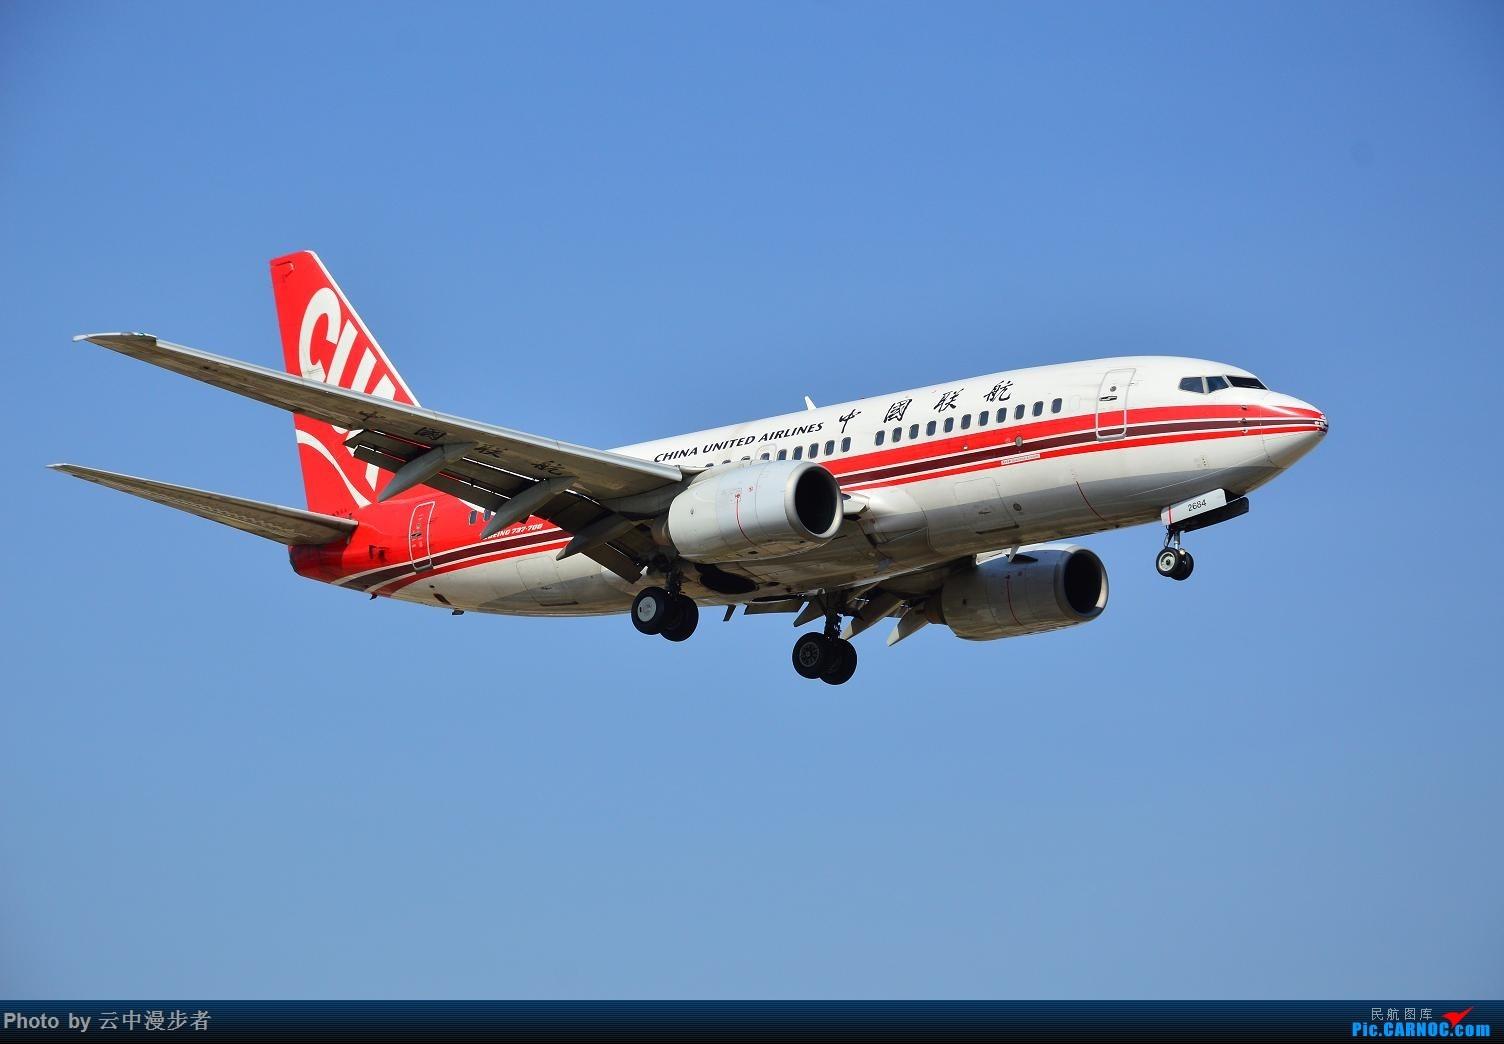 Re:[原创]好天就是好货,拍什么都好看 BOEING 737-700 B-2684 中国厦门高崎国际机场